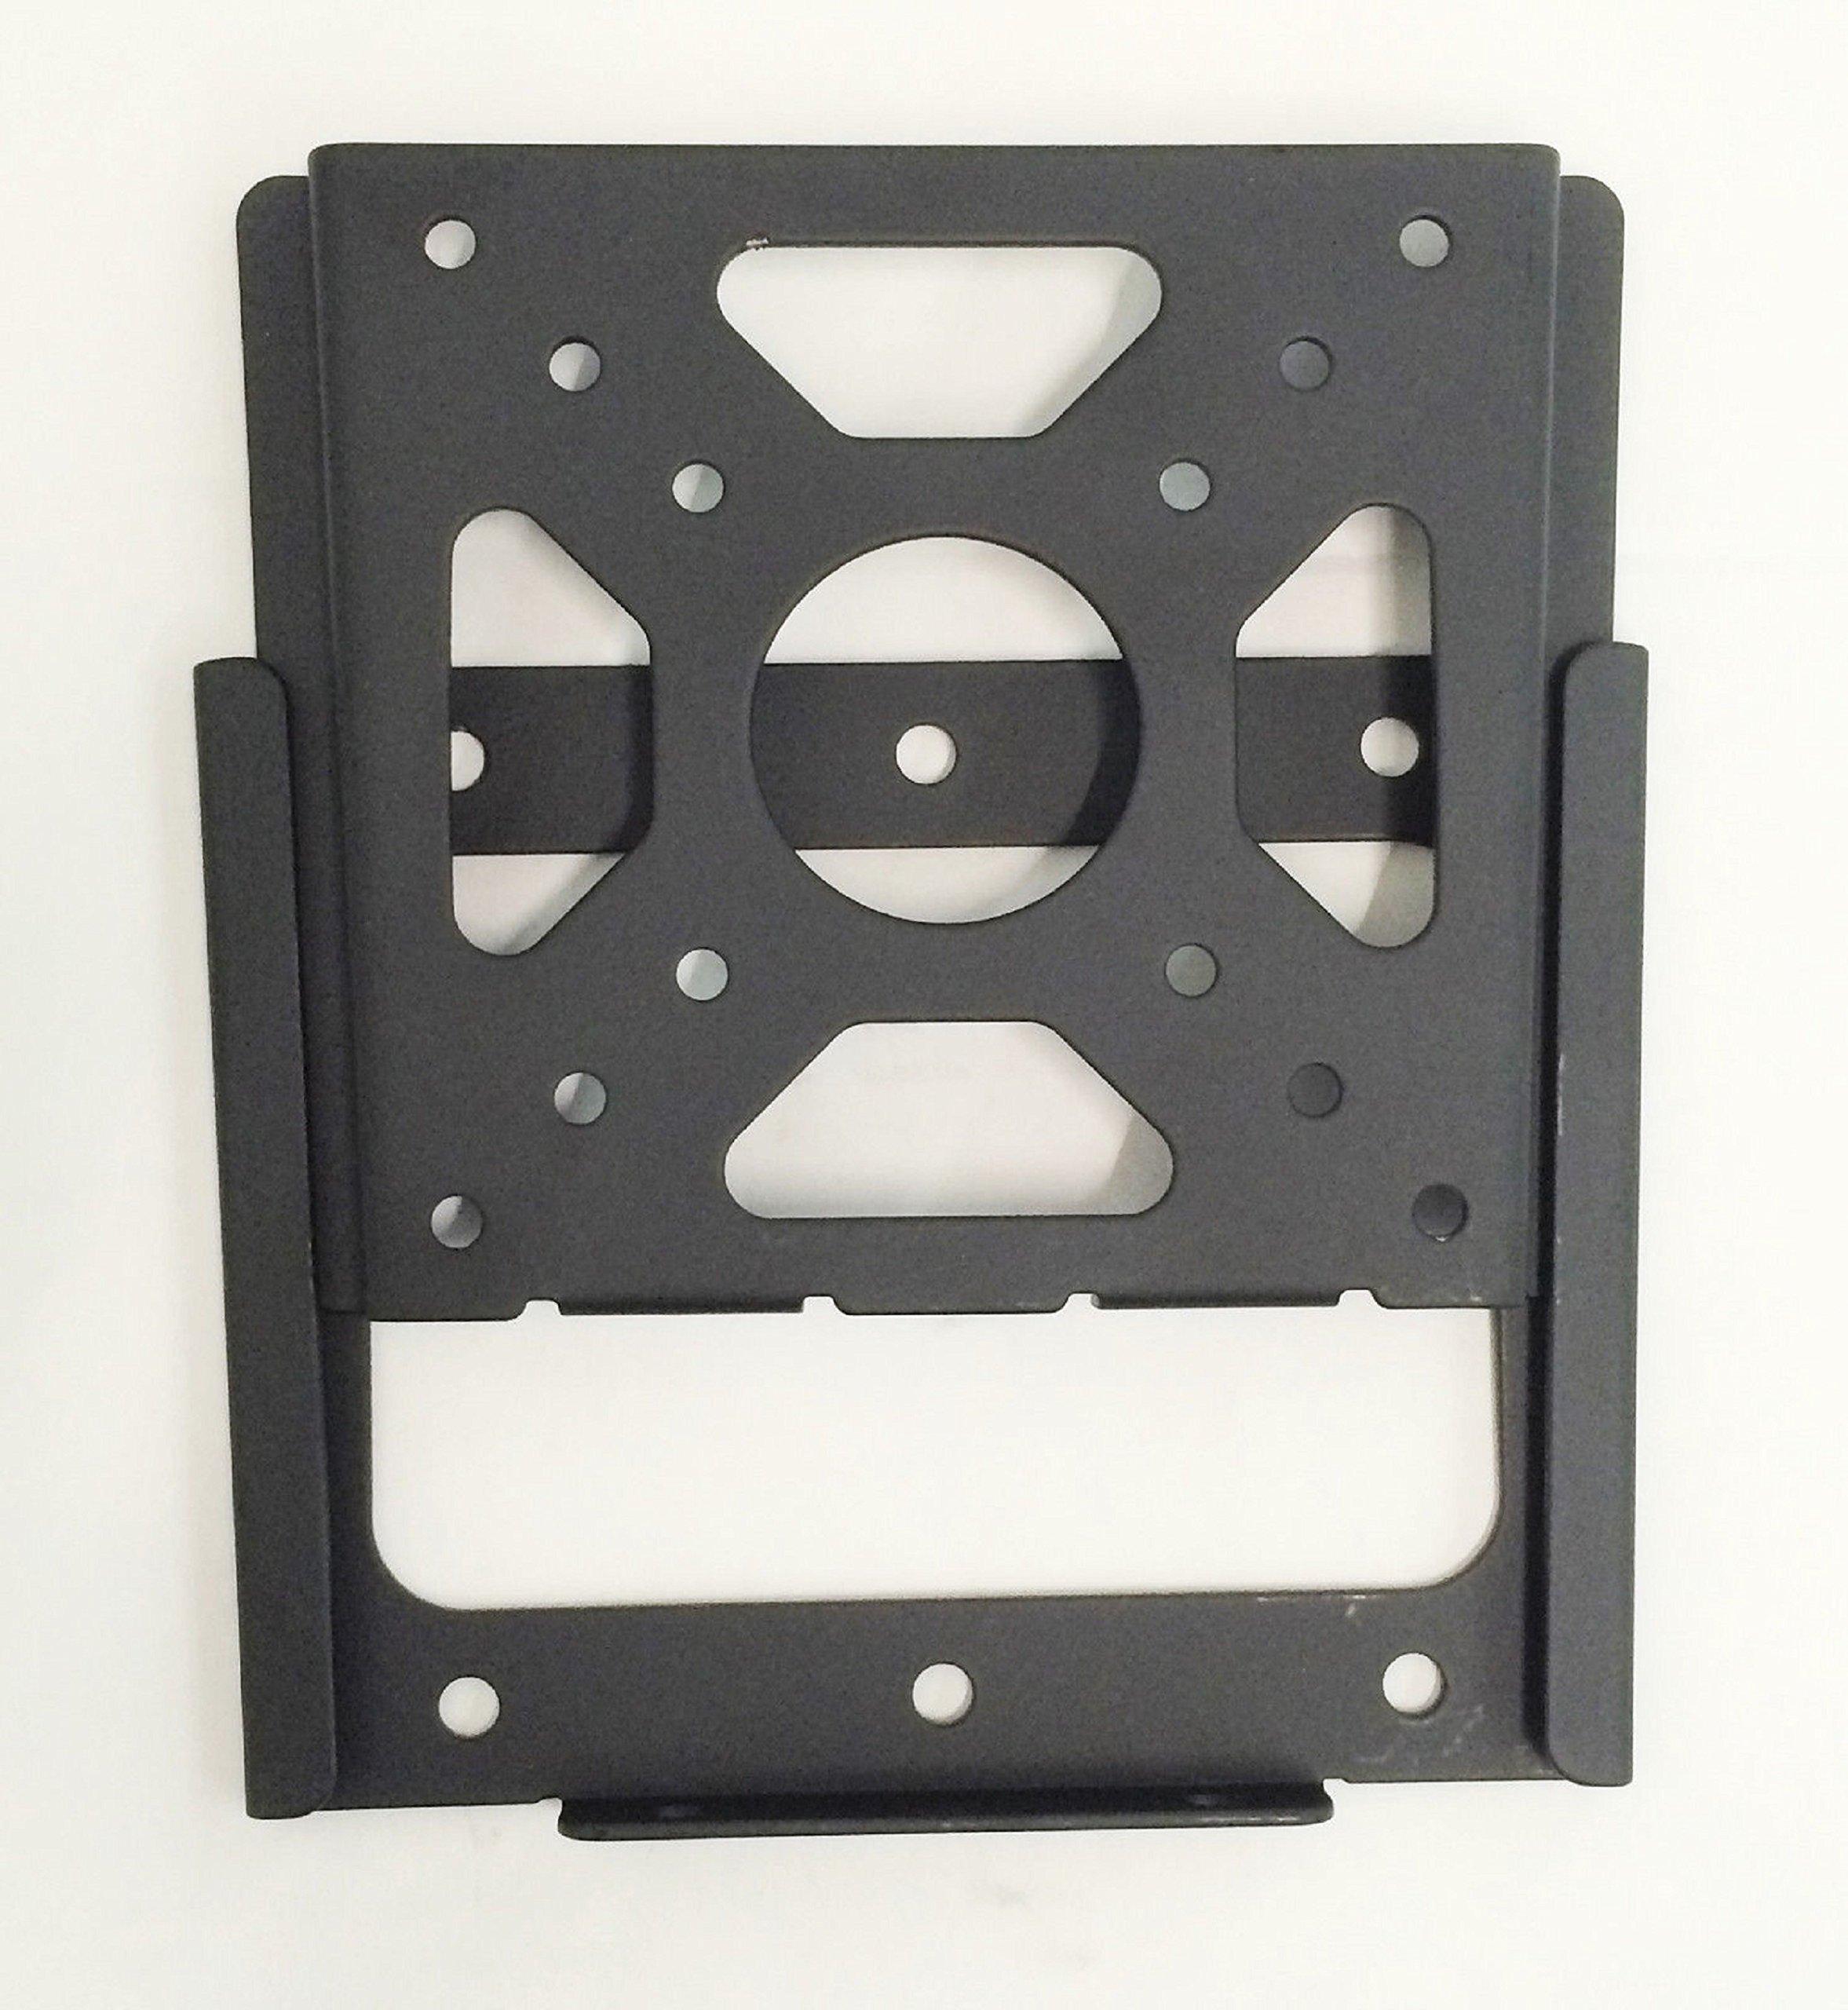 Wennow Flat TV/Monitor Small to Med (10-24'' Screen) Fixed Wall Mount VESA Bracket